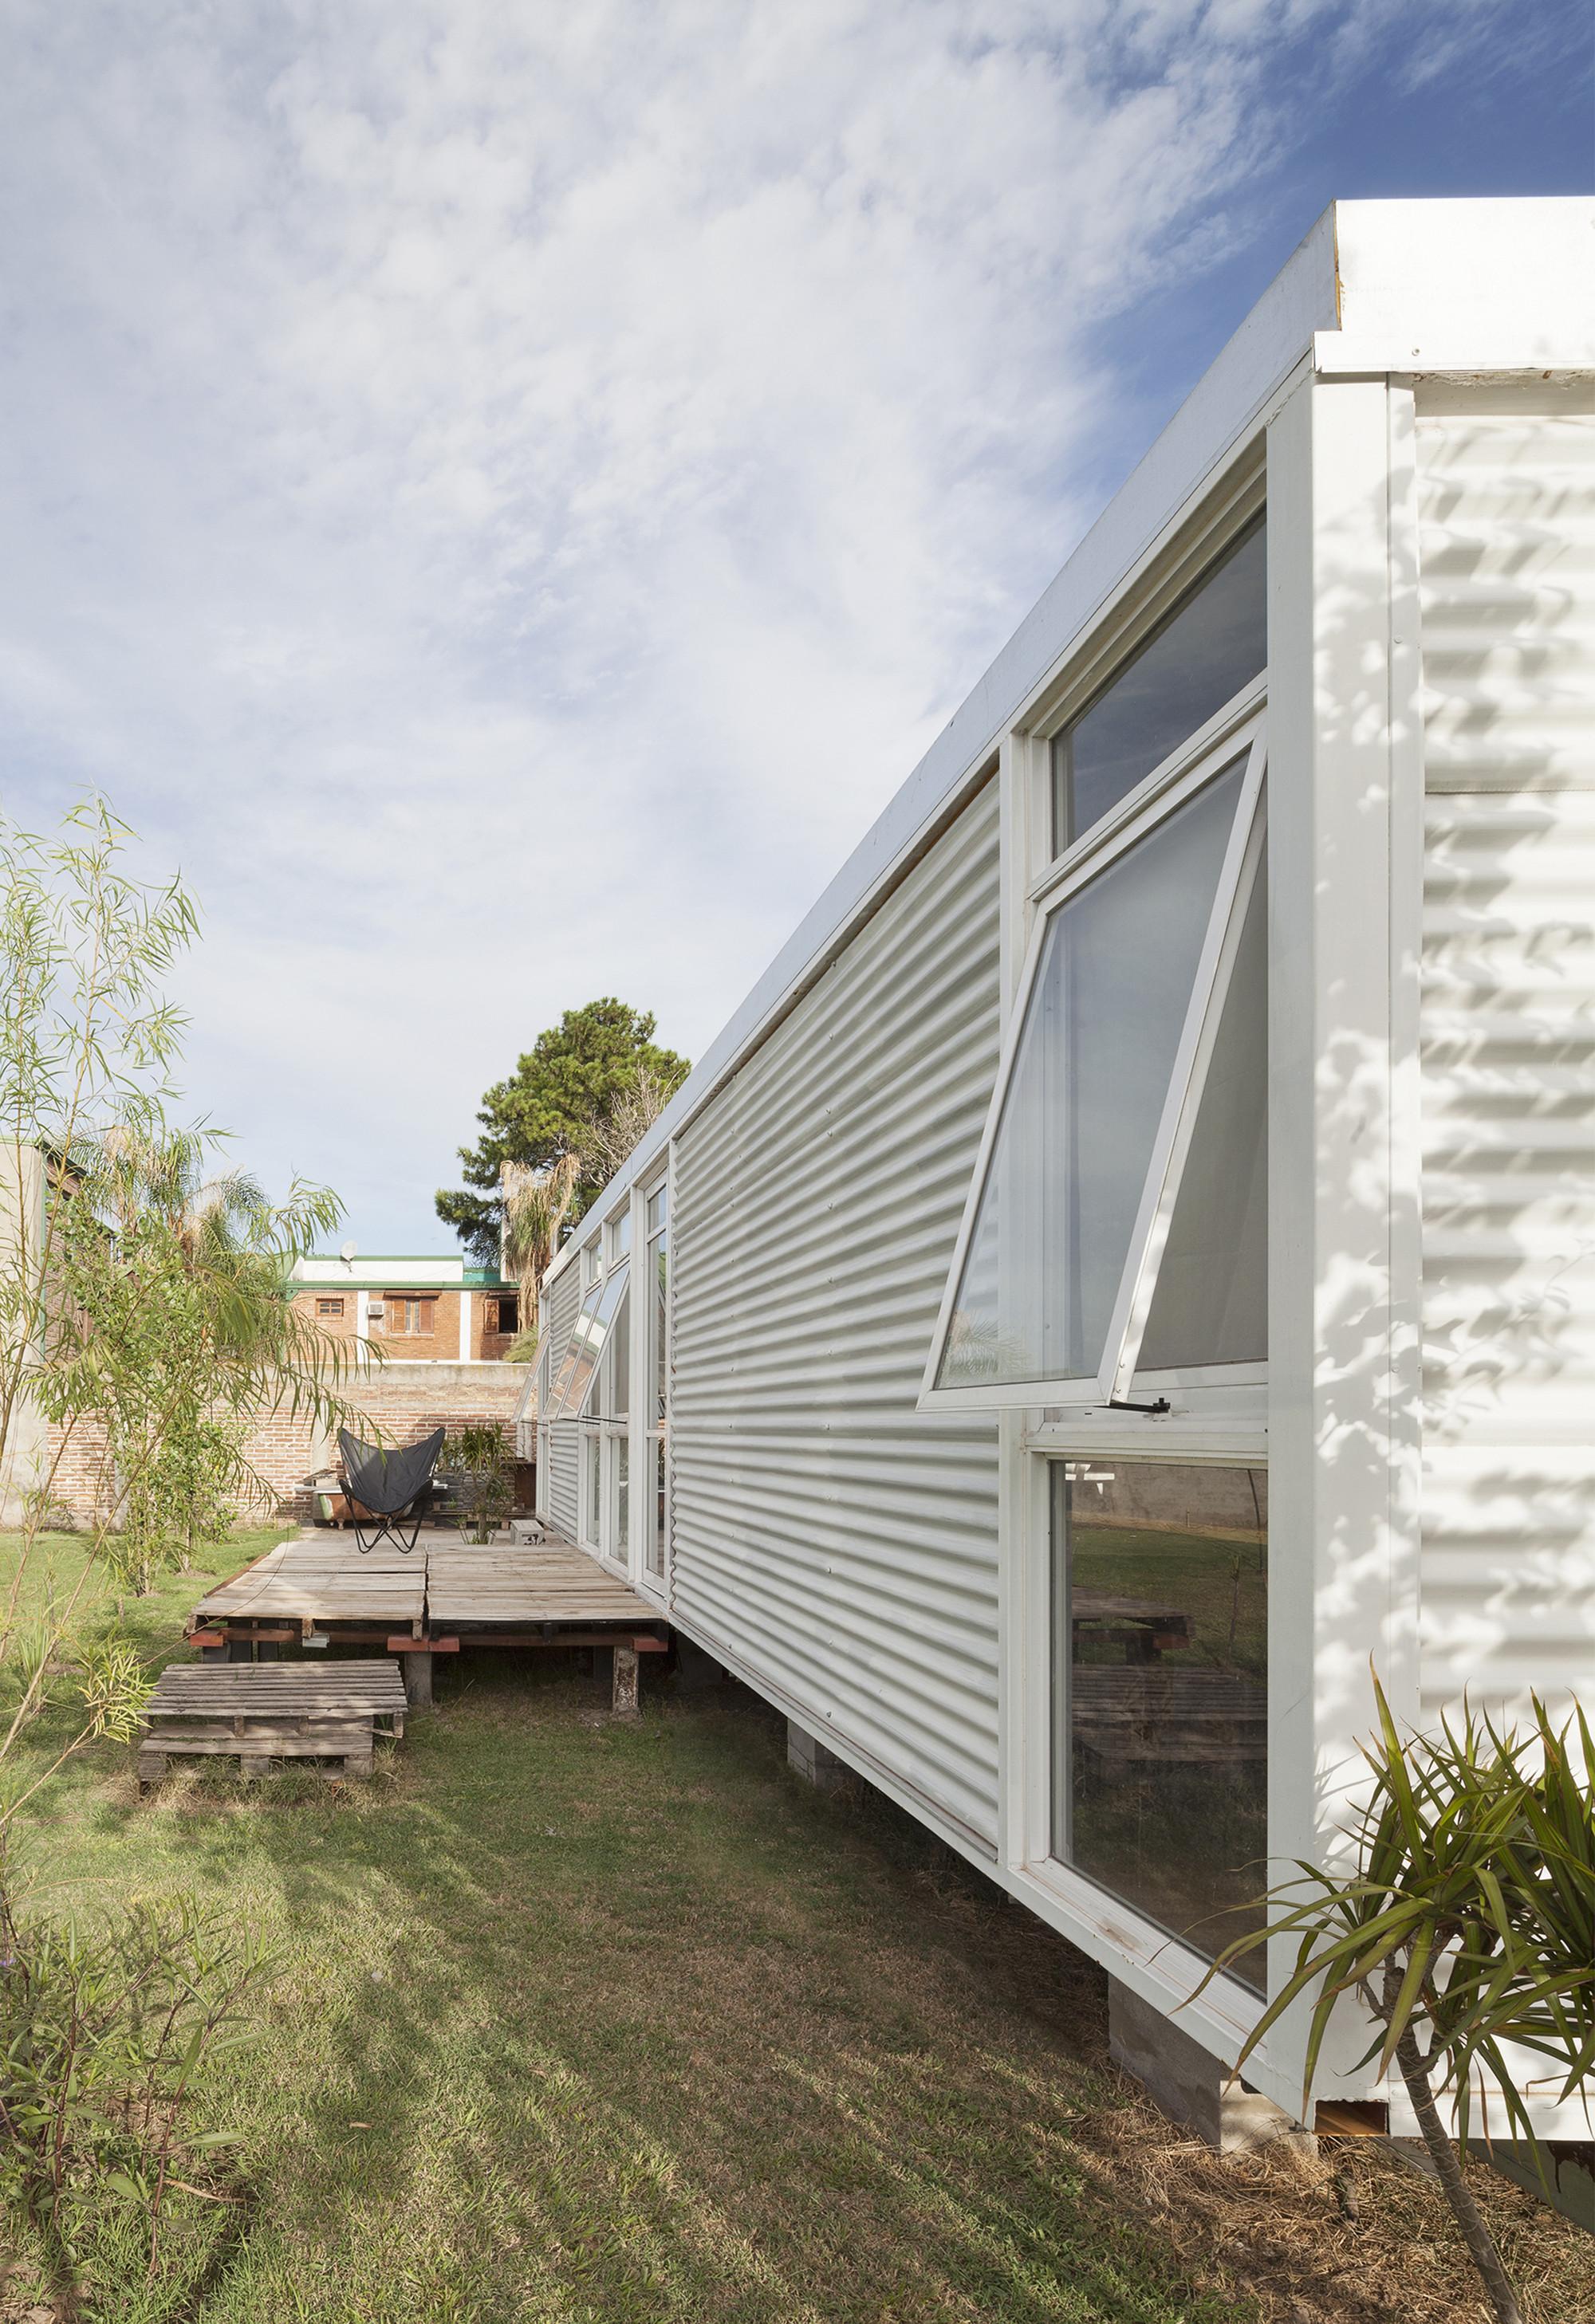 gallery of m a house matias pons estel 4. Black Bedroom Furniture Sets. Home Design Ideas